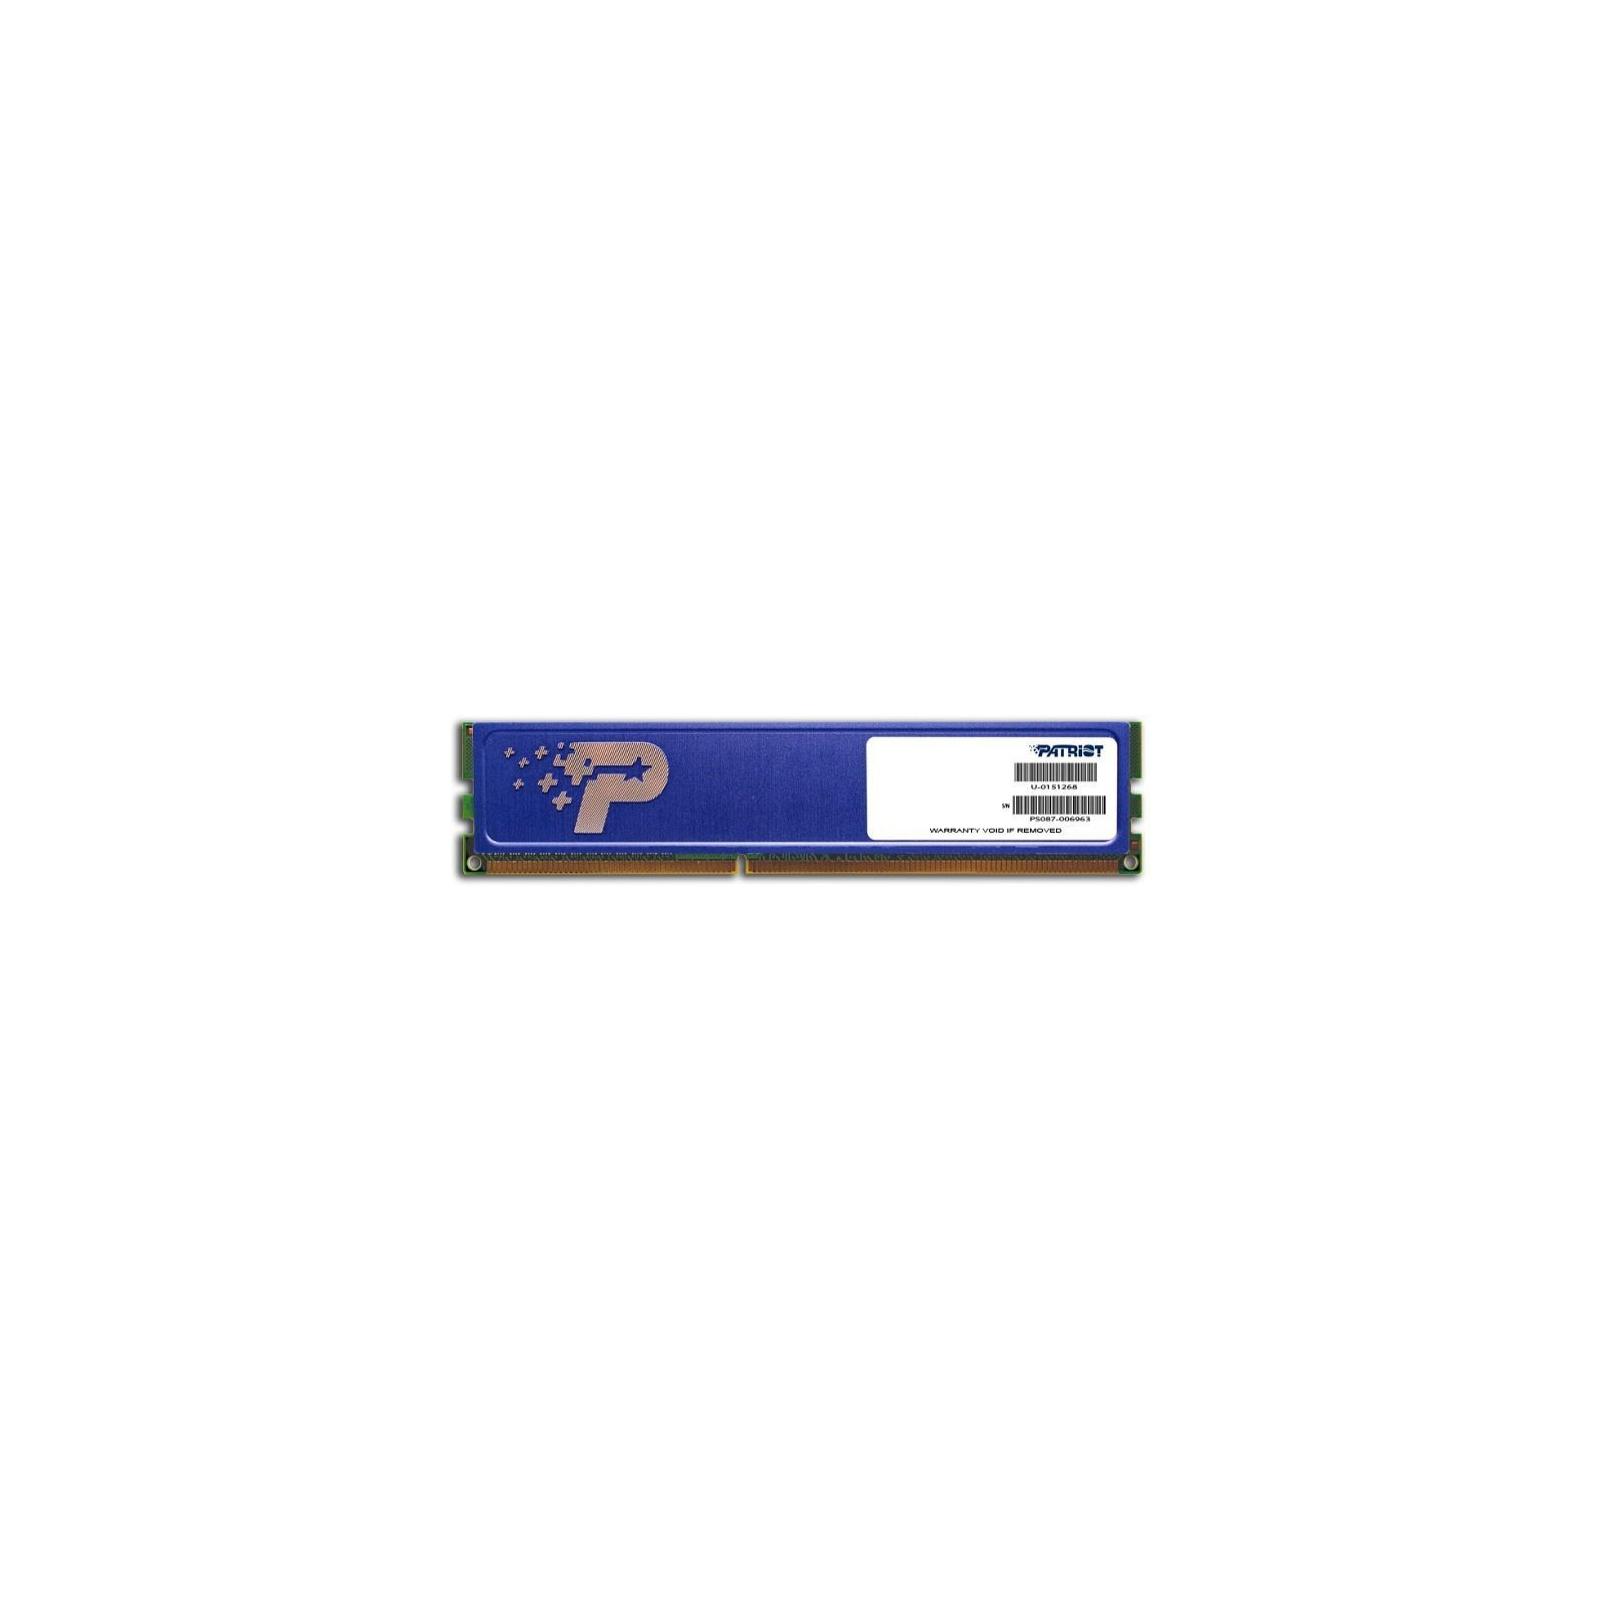 Модуль памяти для компьютера DDR3 4GB 1600 MHz Patriot (PSD34G160081H)